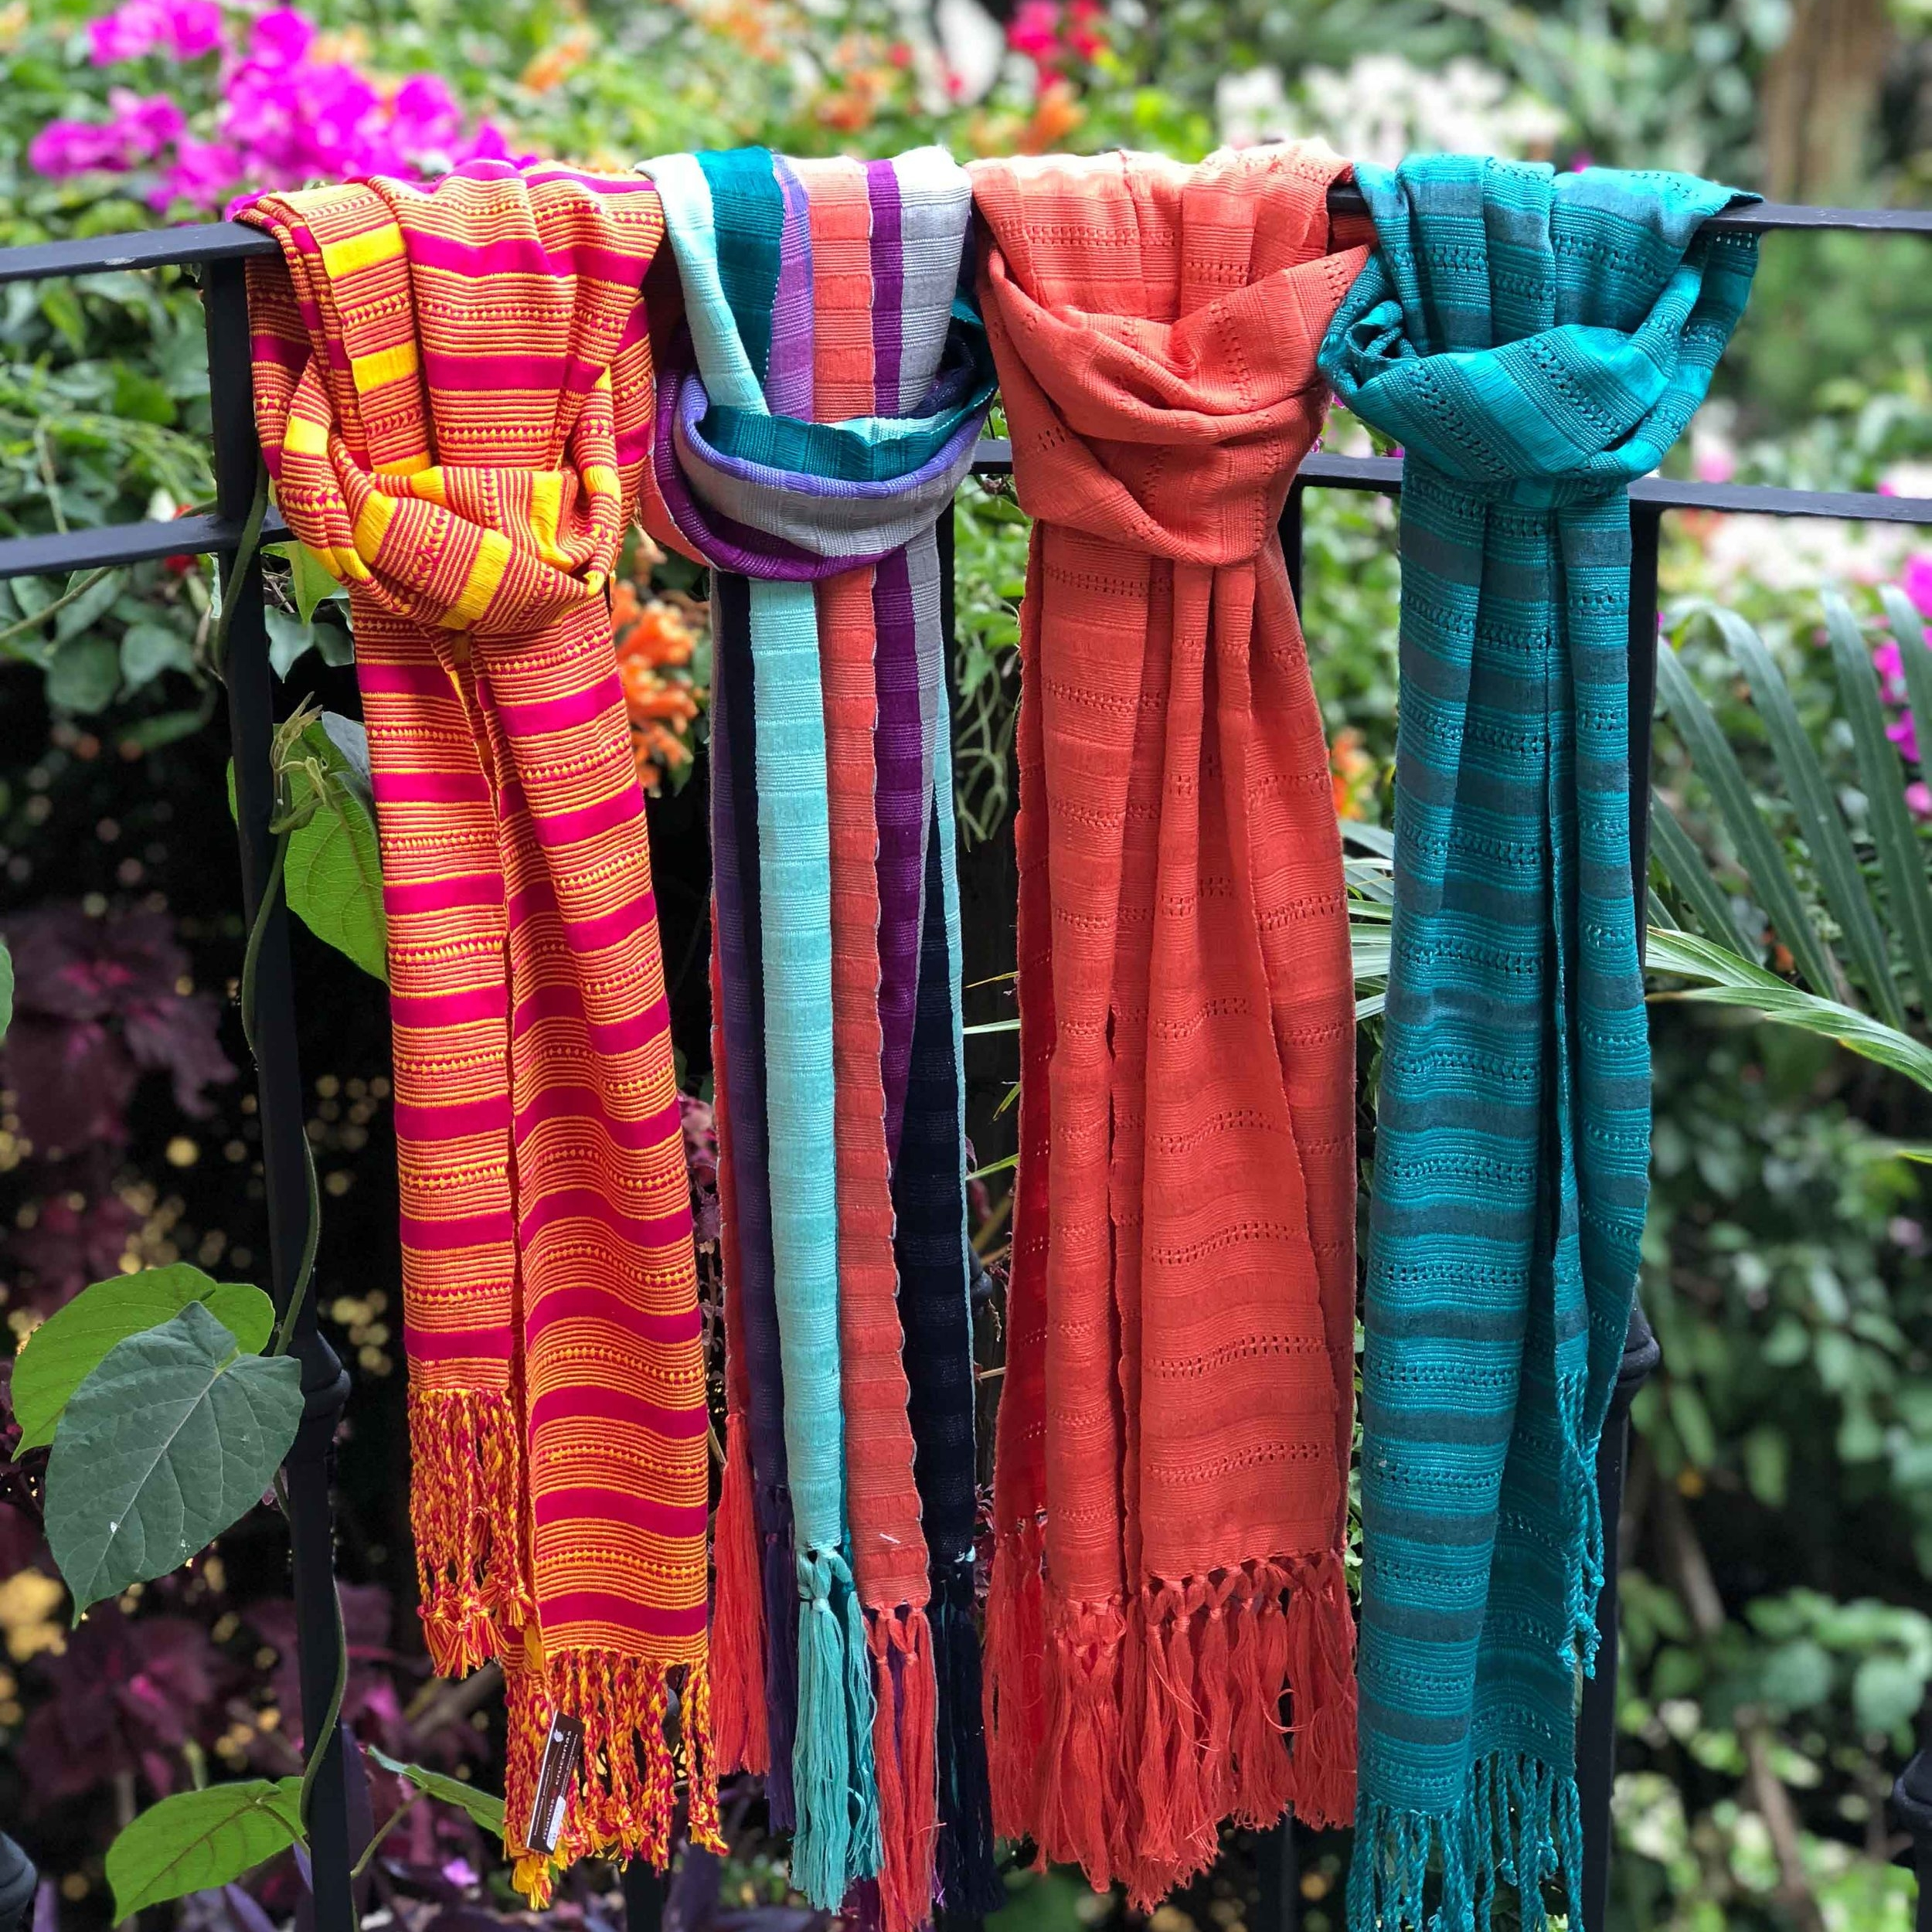 clothing-Amigos scarves4-0883.jpg